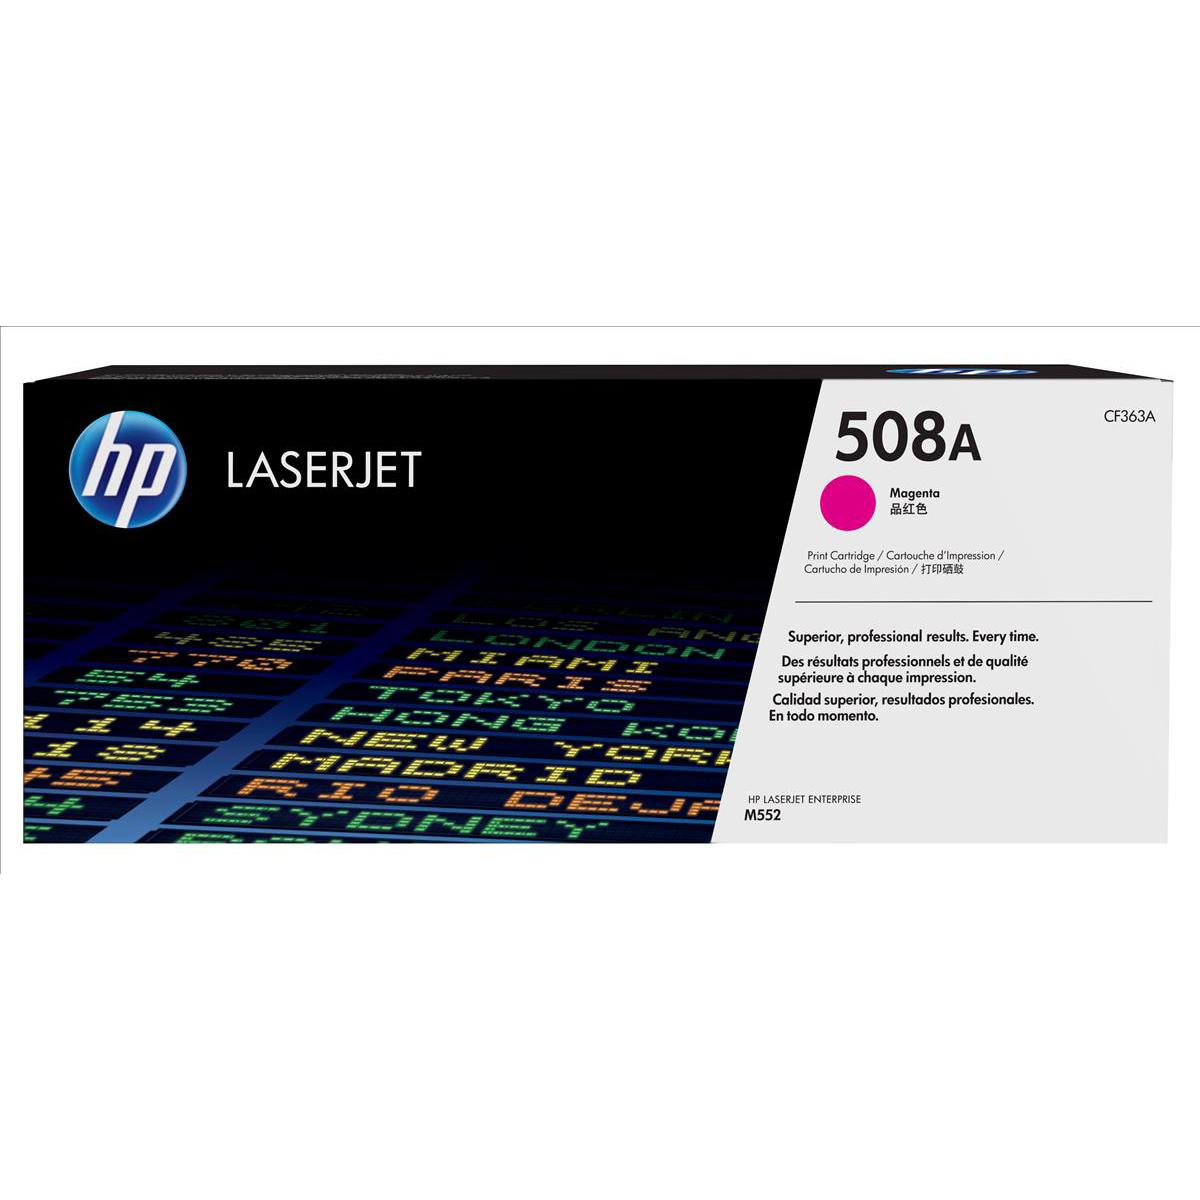 Hewlett Packard [HP] 508A LaserJet Toner Cartridge Page Life 5000pp Magenta Ref CF363A